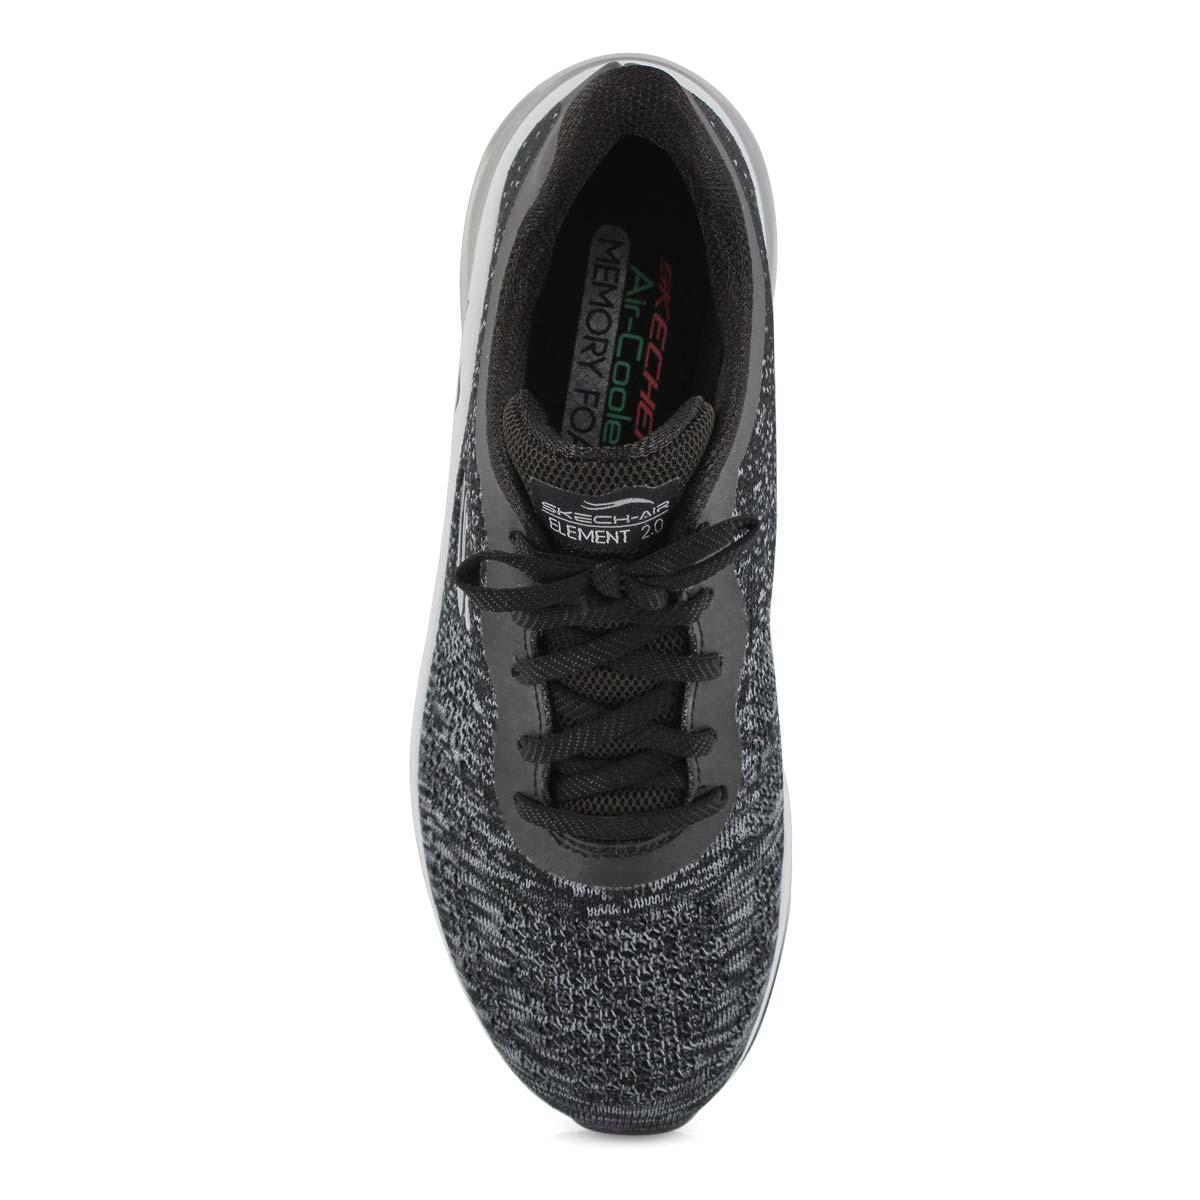 Women's Skech-Air Element 2.0 Sneaker - Black